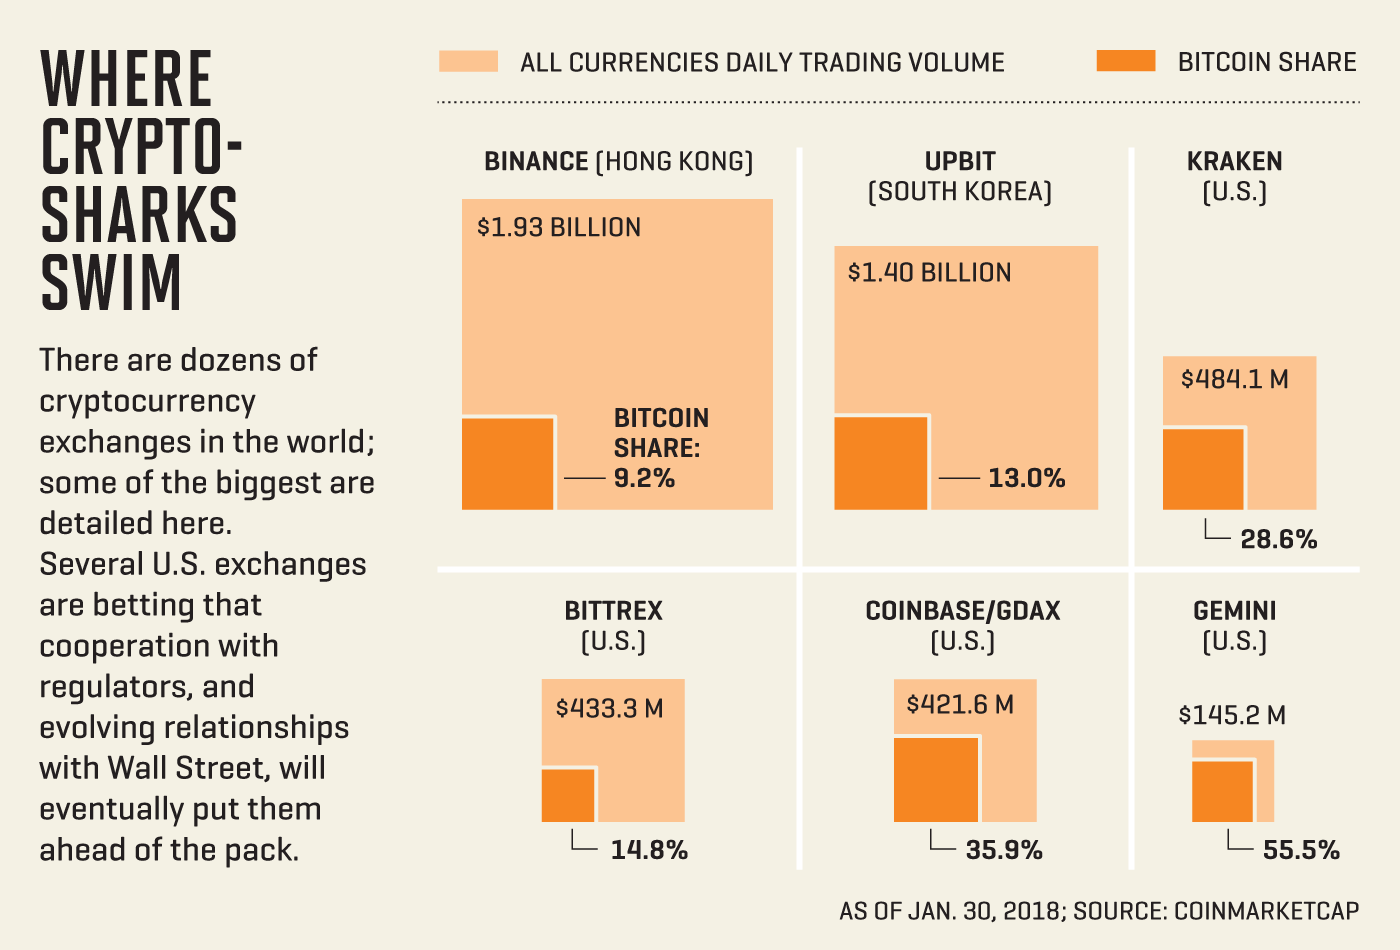 Bitcoin News: Circle Buys Poloniex in Big Cryptocurrency